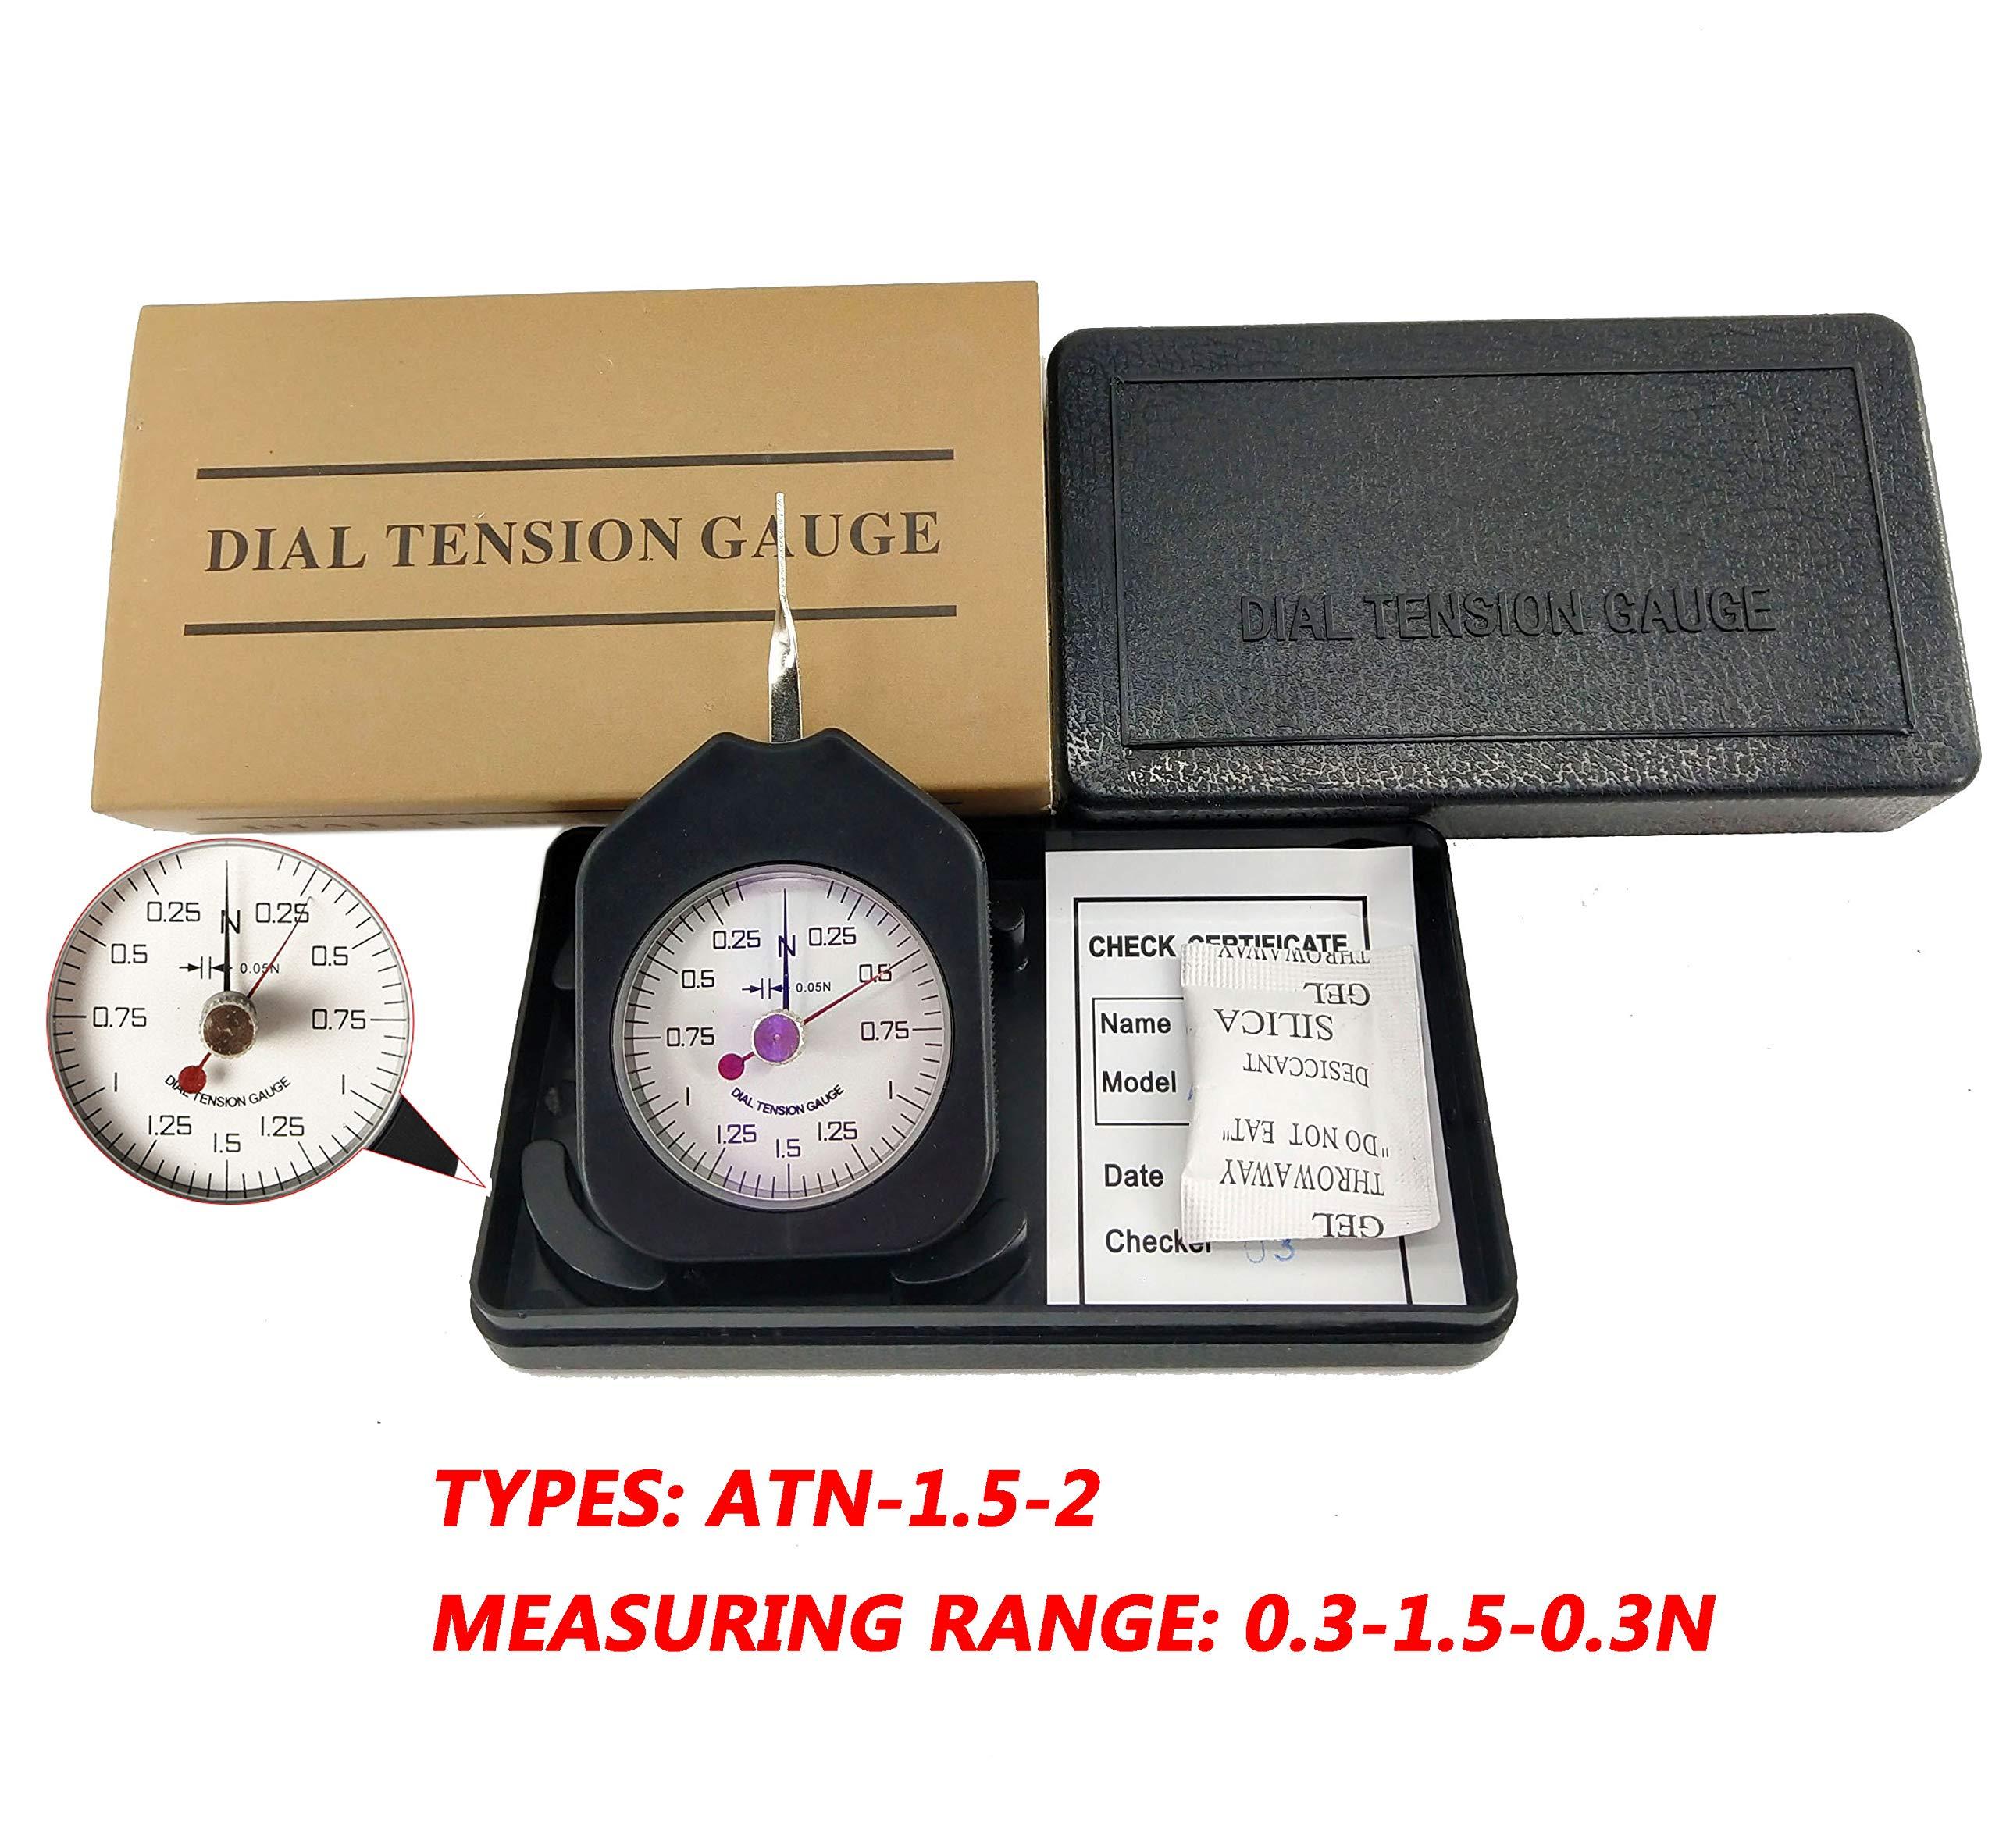 HFBTE ATN-1.5-2 Pocket Size Double Pointer Tension Gauge Tensionmeter with 0.3-1.5-0.3N Measurement Range 0.05N Division Value by HFBTE